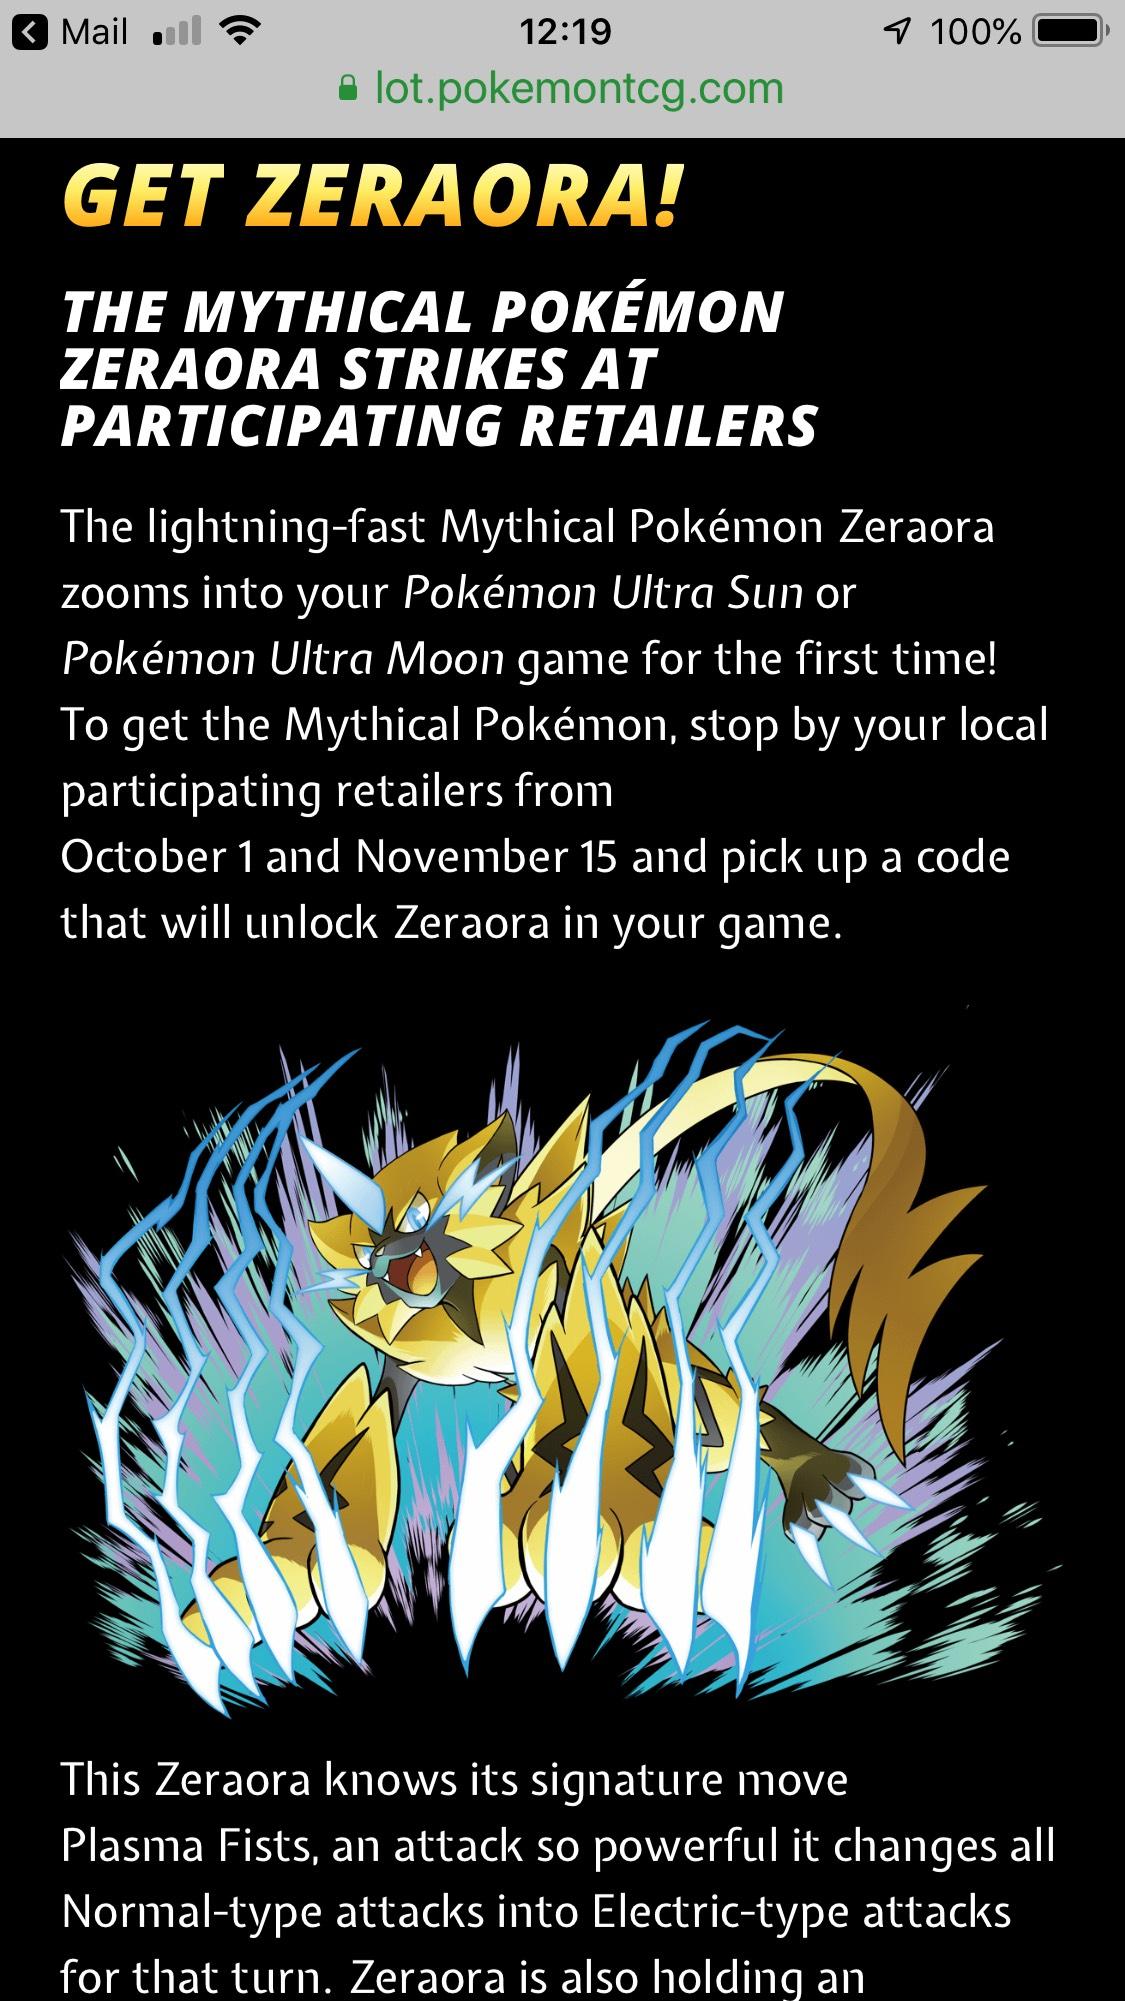 Free mythical Pokemon zeraora - hotukdeals